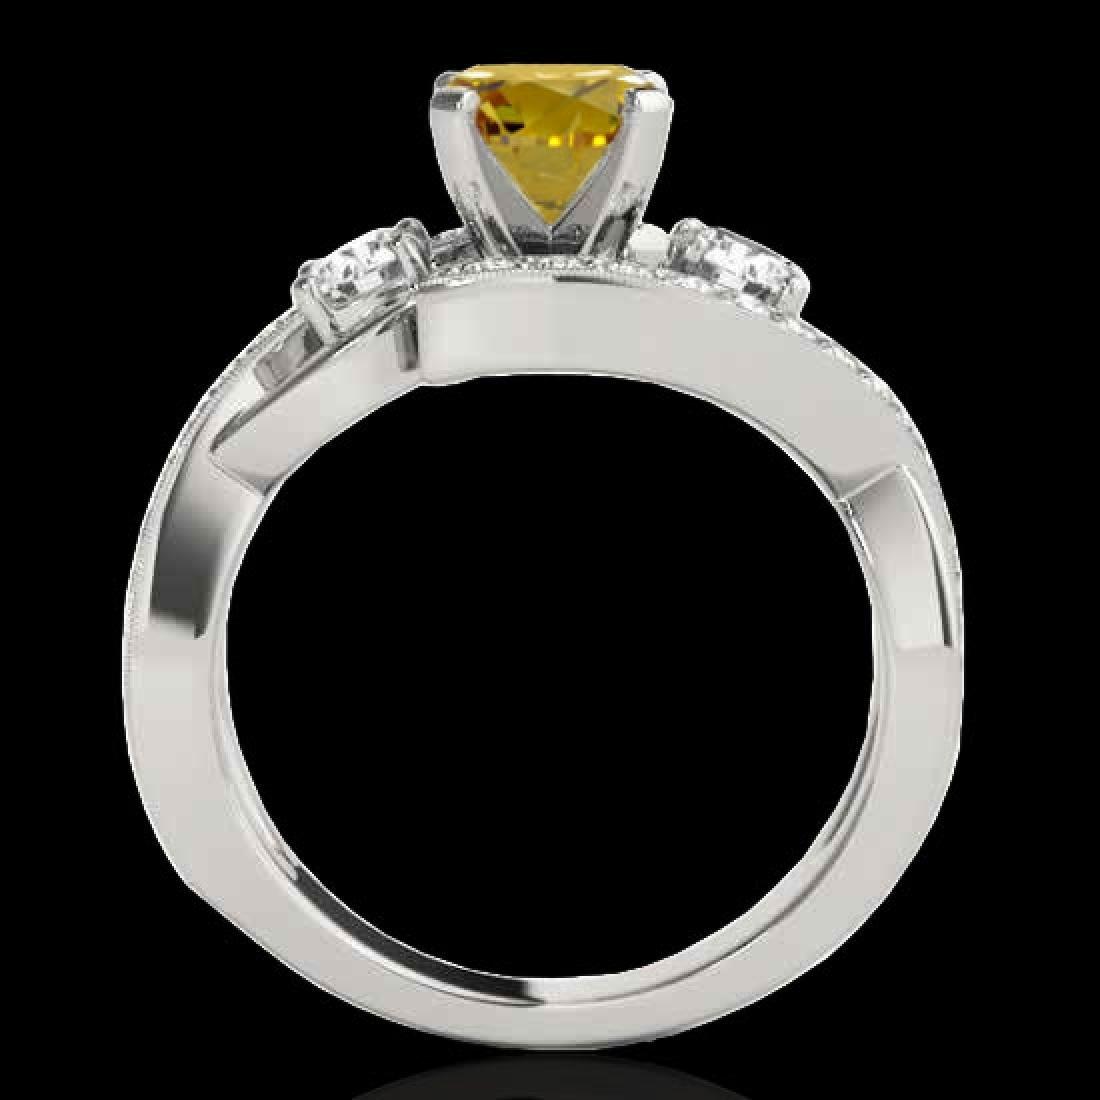 1.76 CTW Certified Si Intense Yellow Diamond Bypass - 2